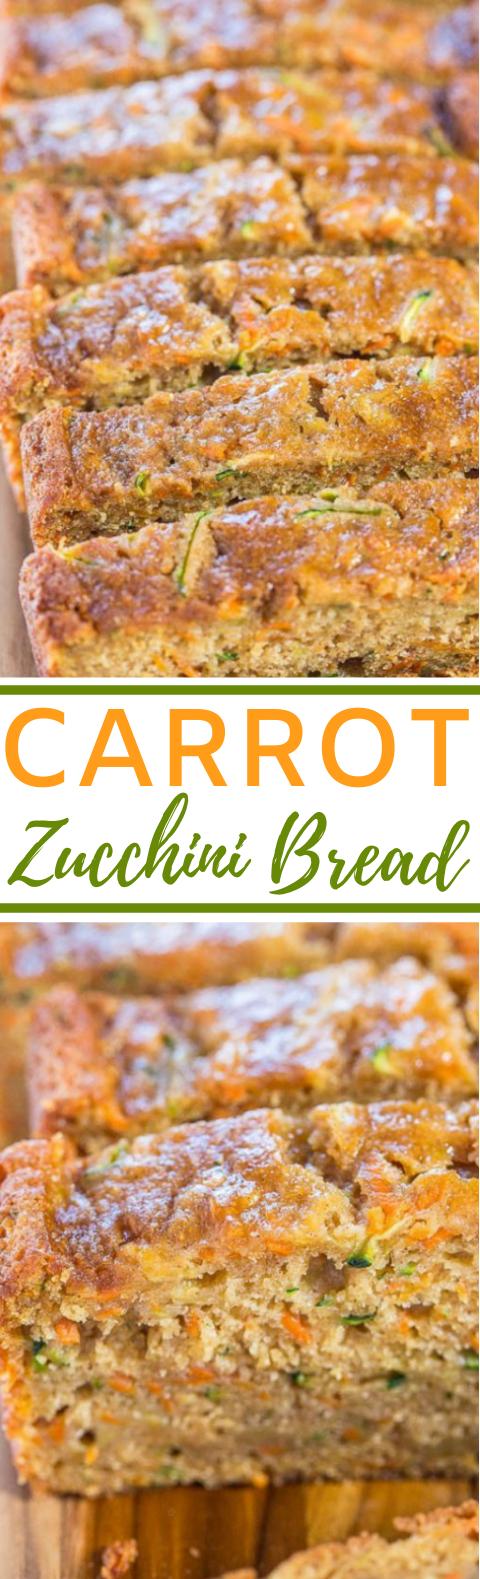 Carrot Zucchini Bread #vegetarian #breakfast #healthy #veggies #bread